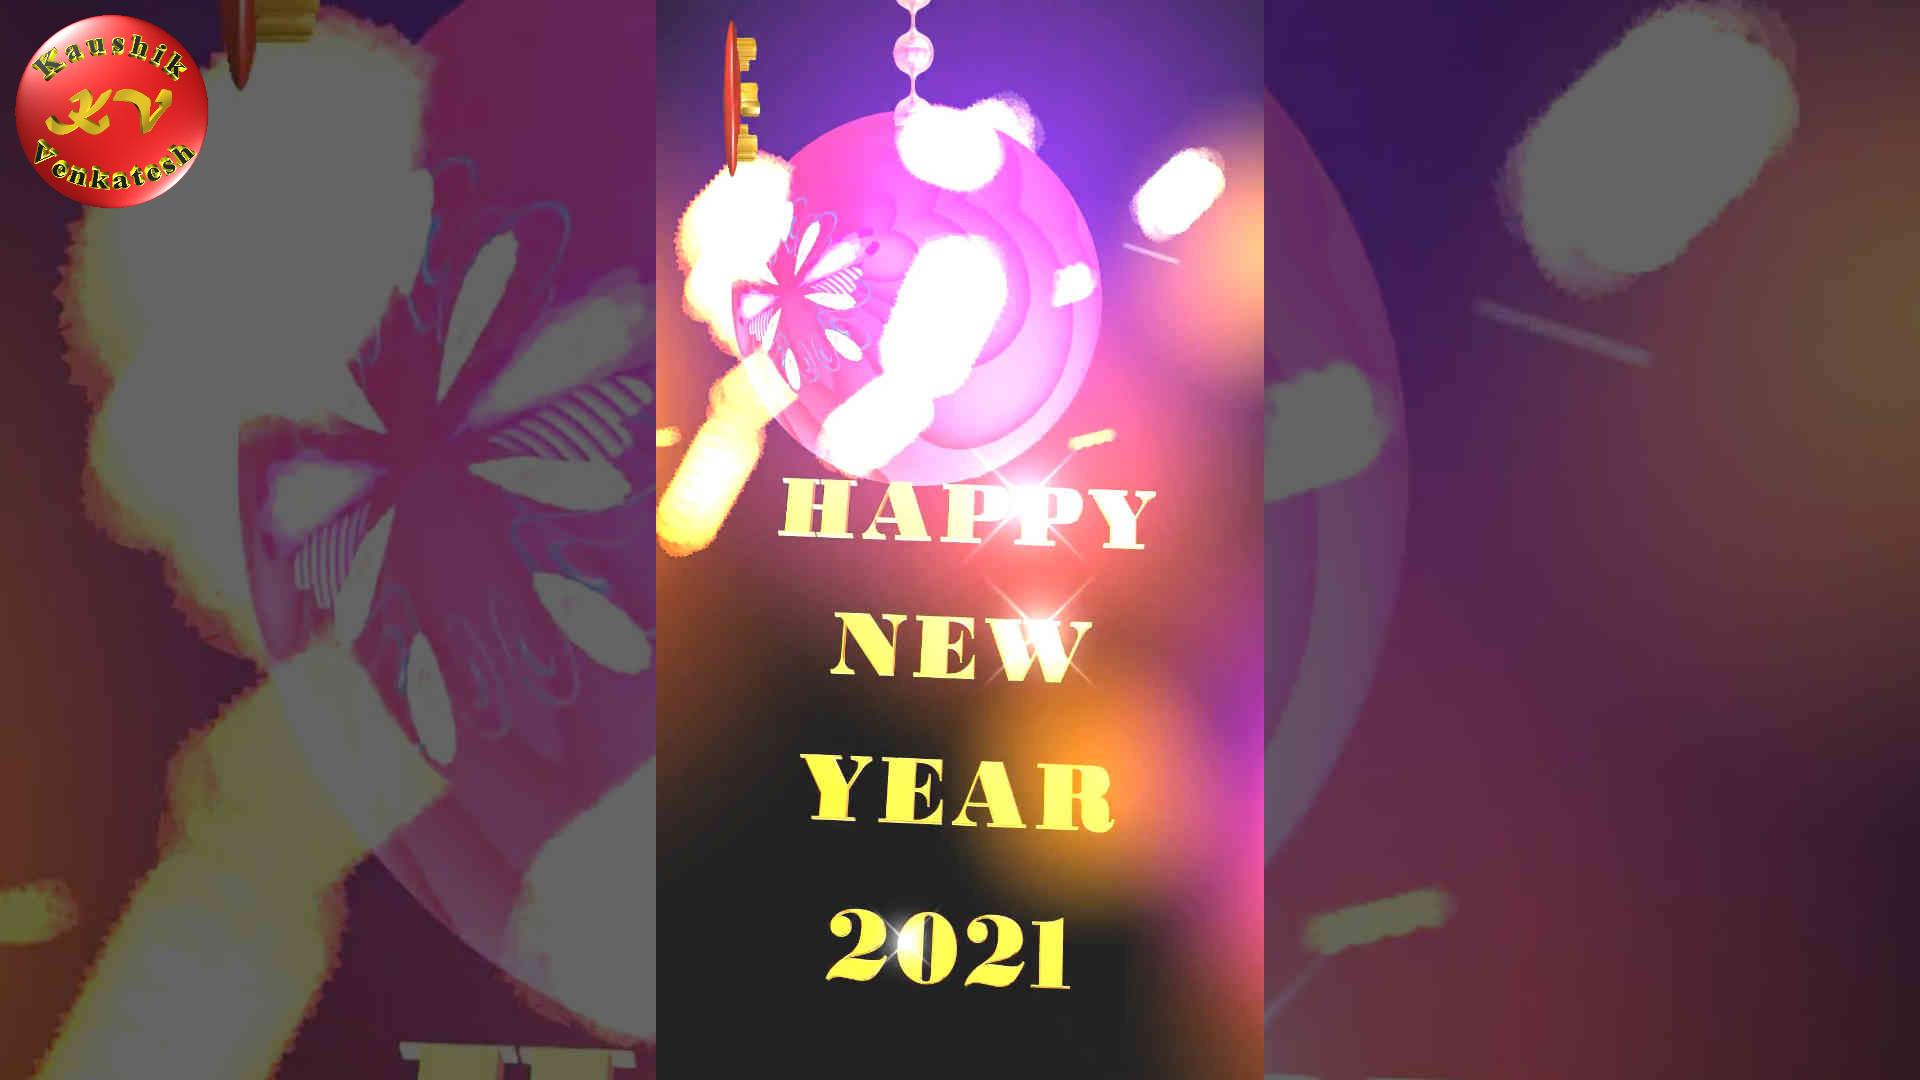 Happy New Year 2021 Video(YouTube Shorts)